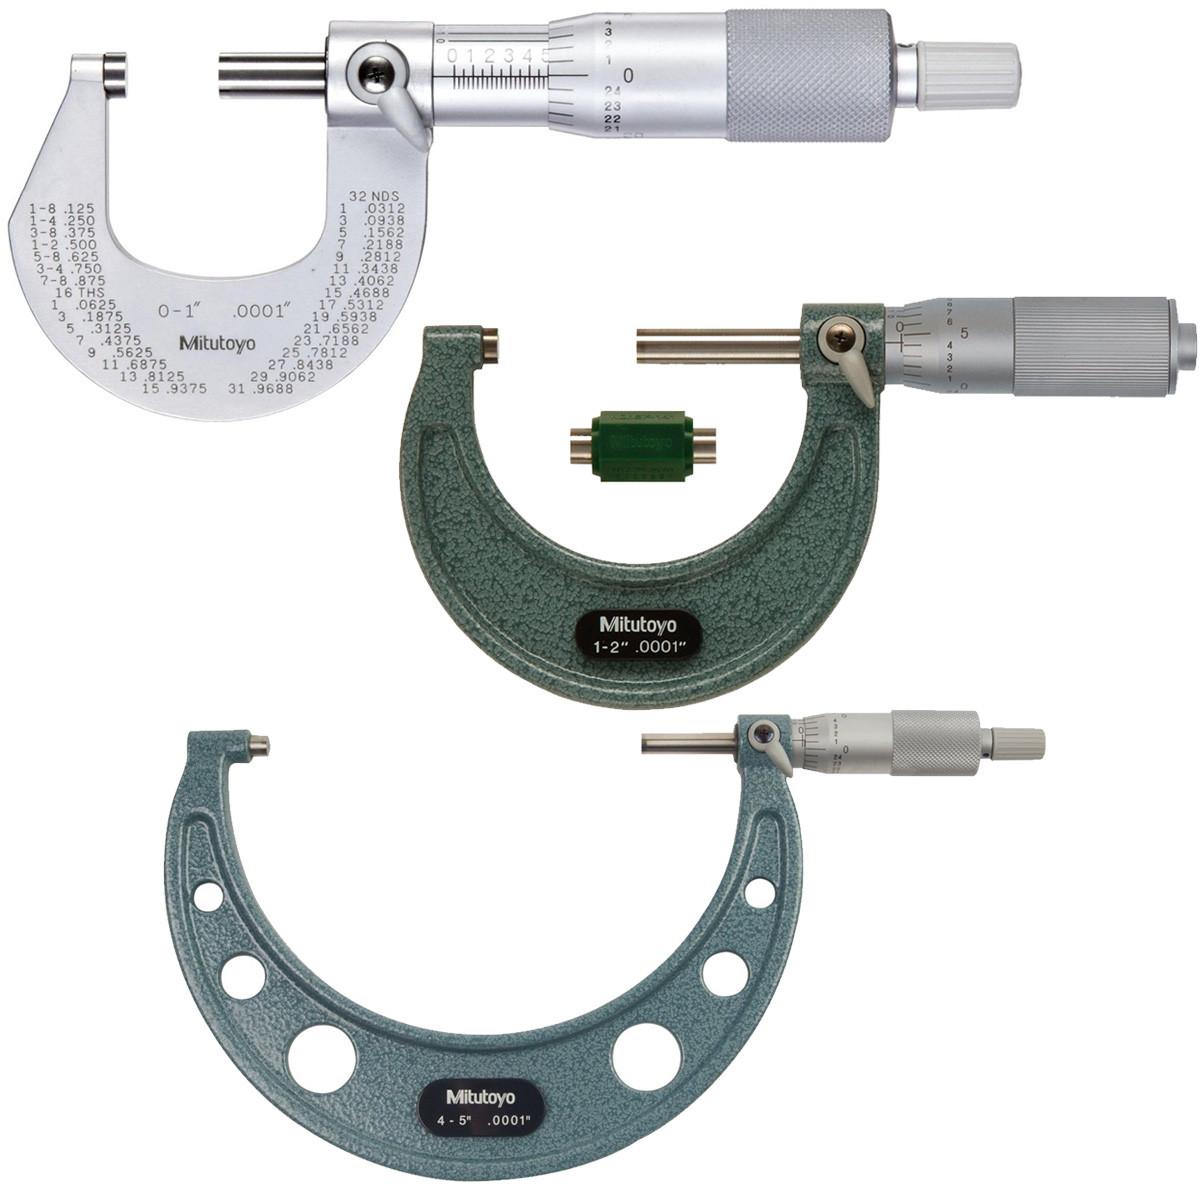 "Ratchet Stop 1-2/"" Satin-chrome Finish Mitutoyo 101-114 Outside Micrometer"